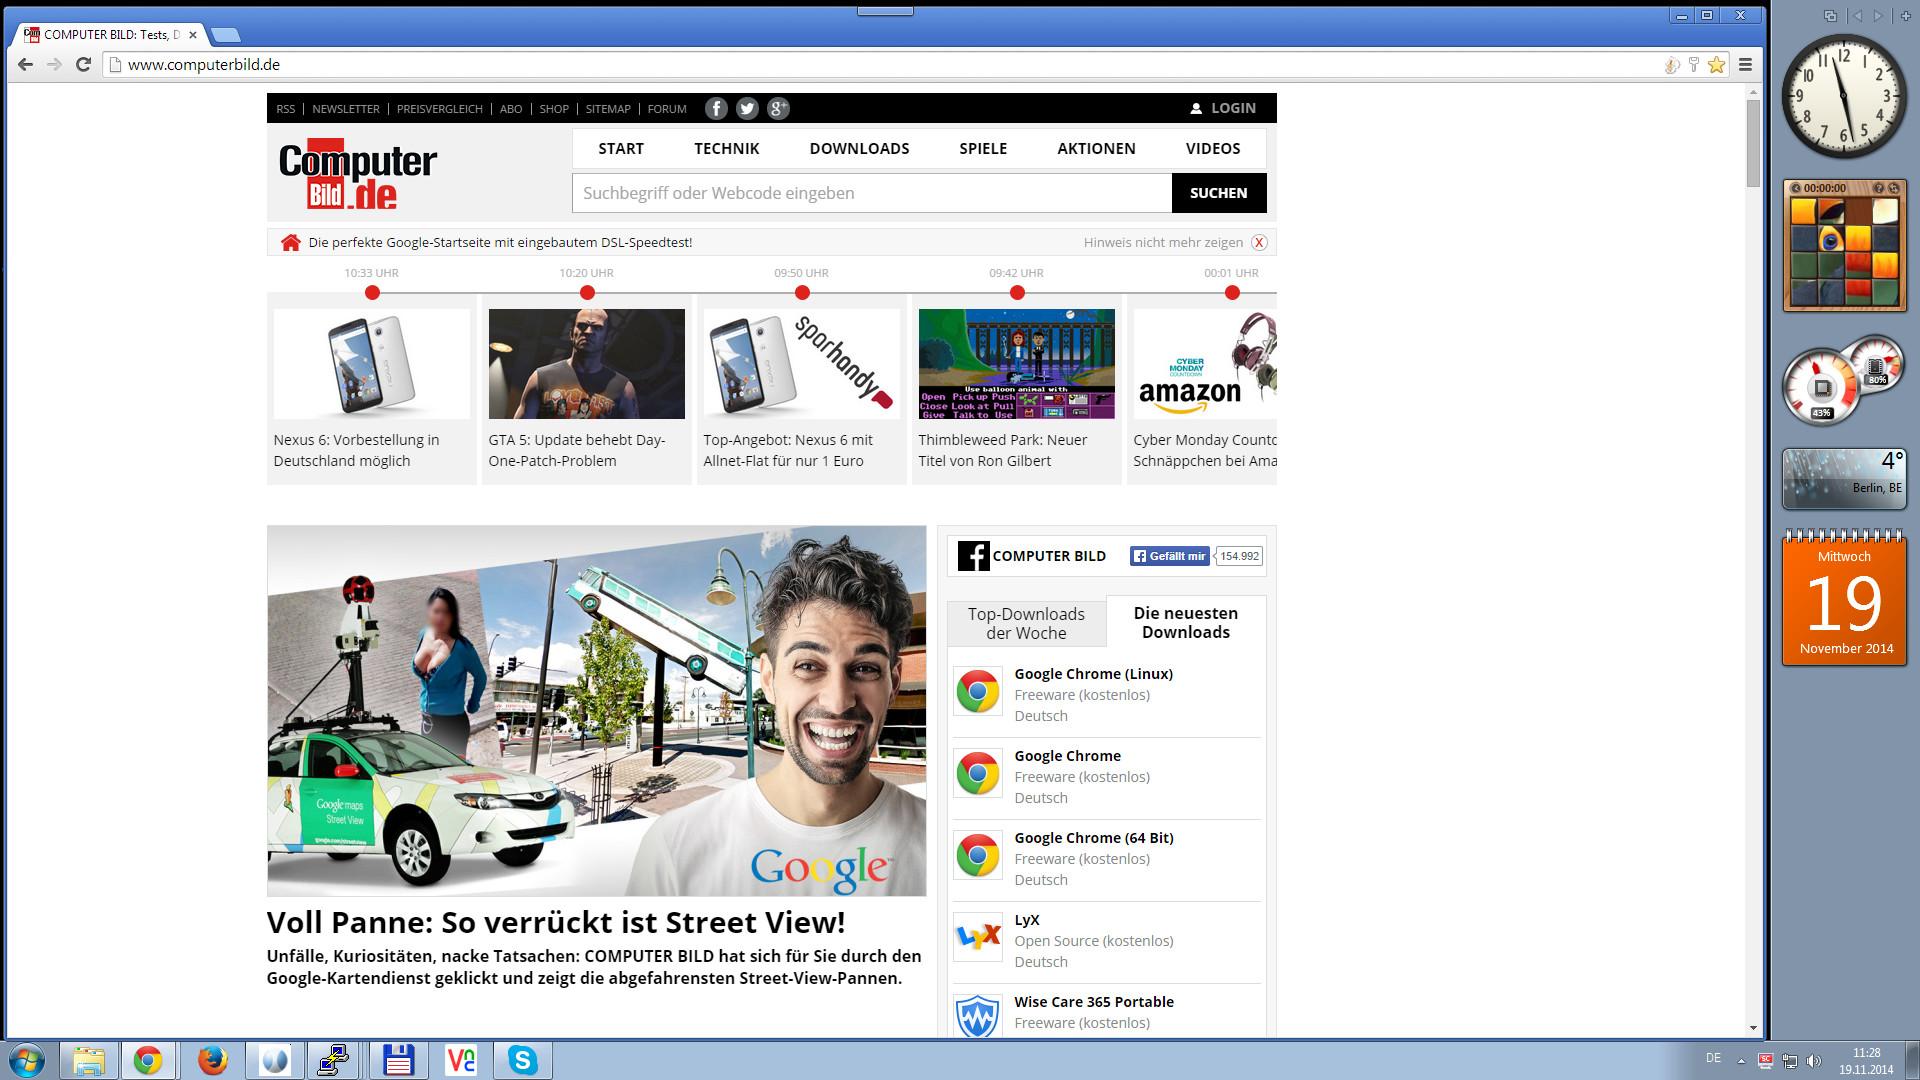 Screenshot 1 - 7 Sidebar